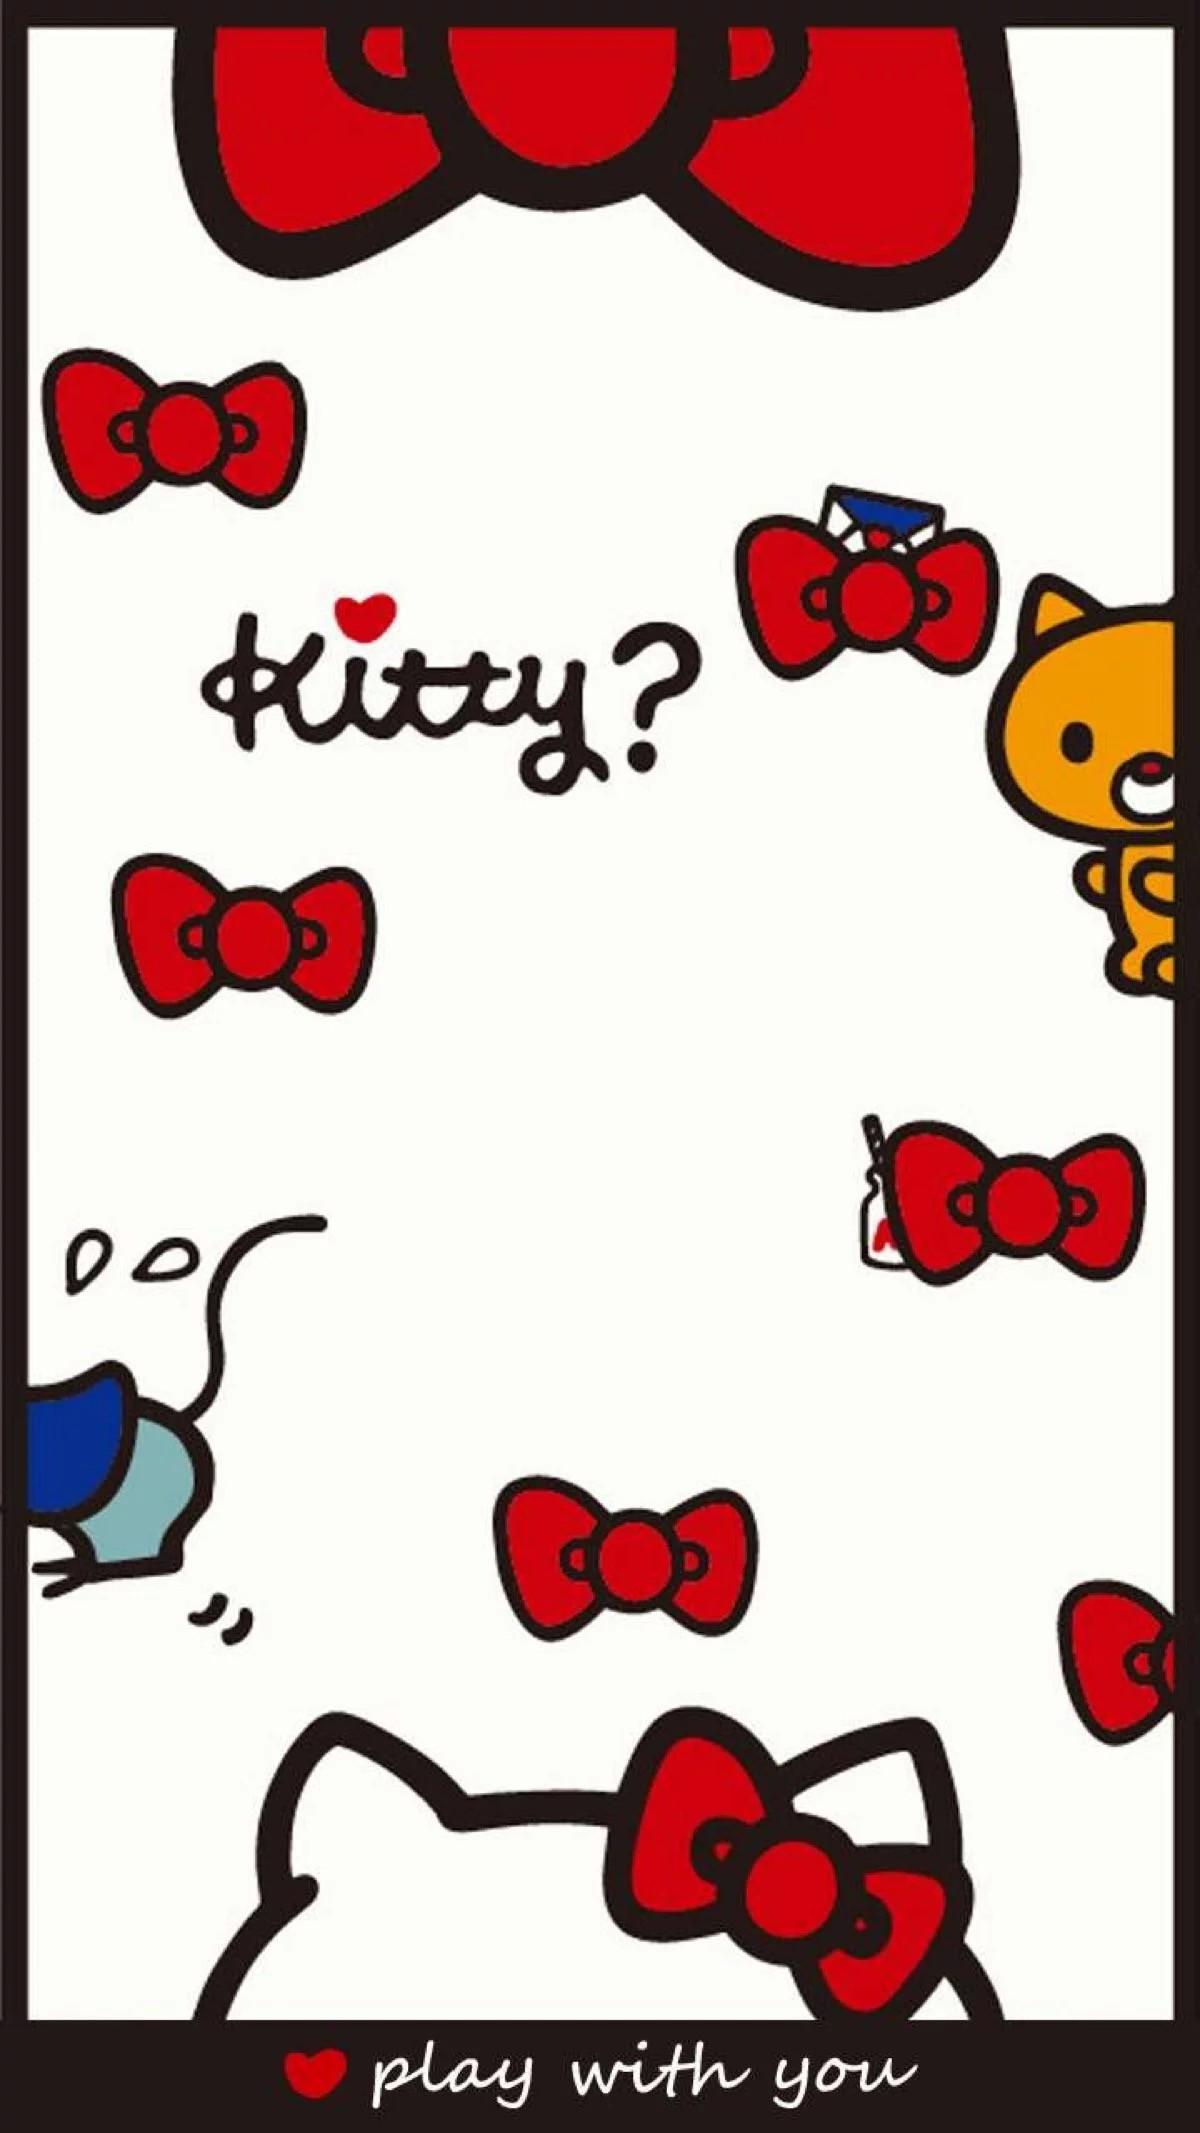 Kitty Wallpaper, Hello Kitty, Sanrio, Phone Wallpapers, Kawaii, Cartoons,  Covers, Screen, Love